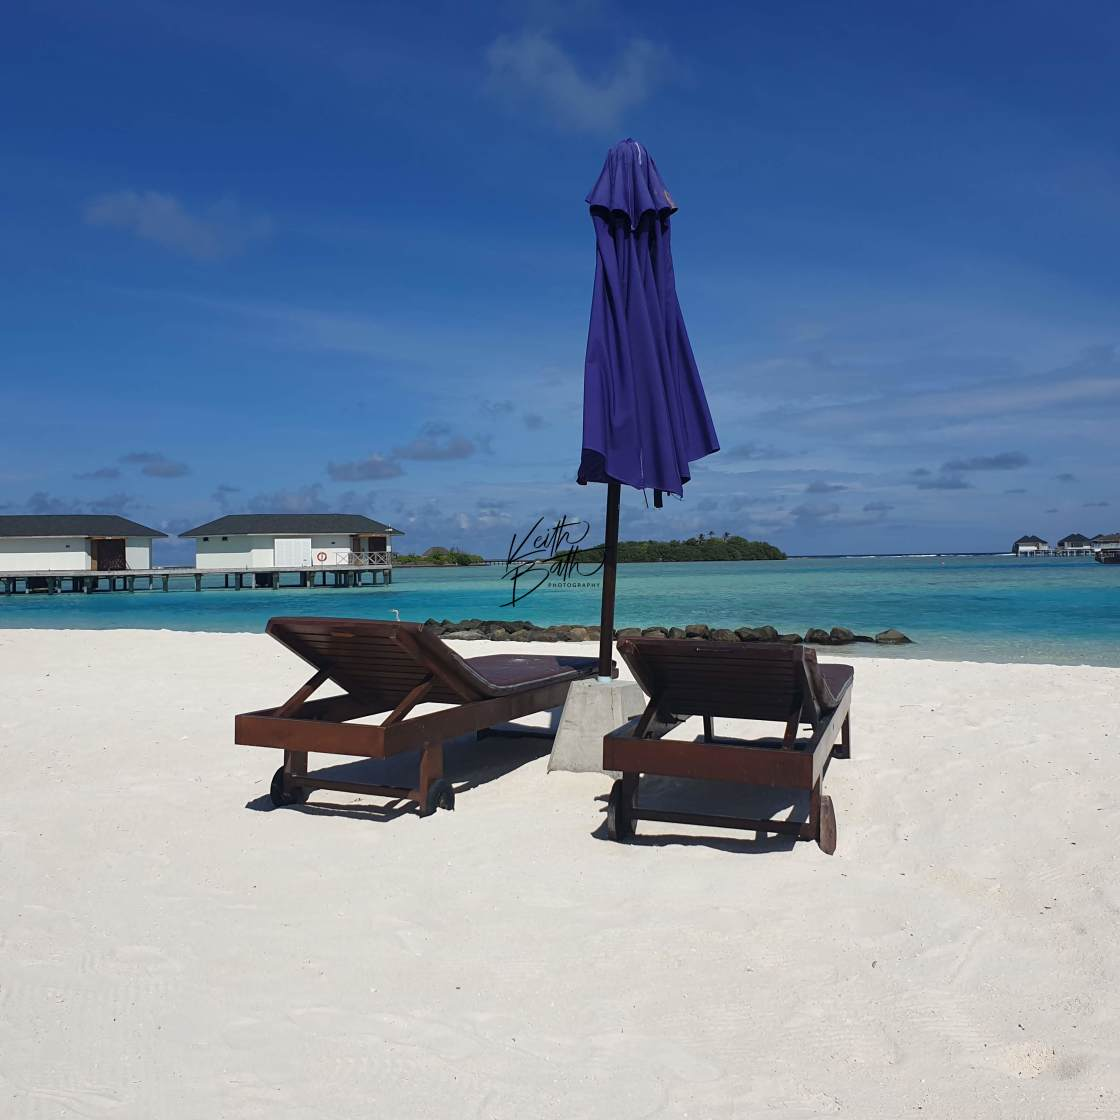 """Deserted beach in Maldives"" stock image"